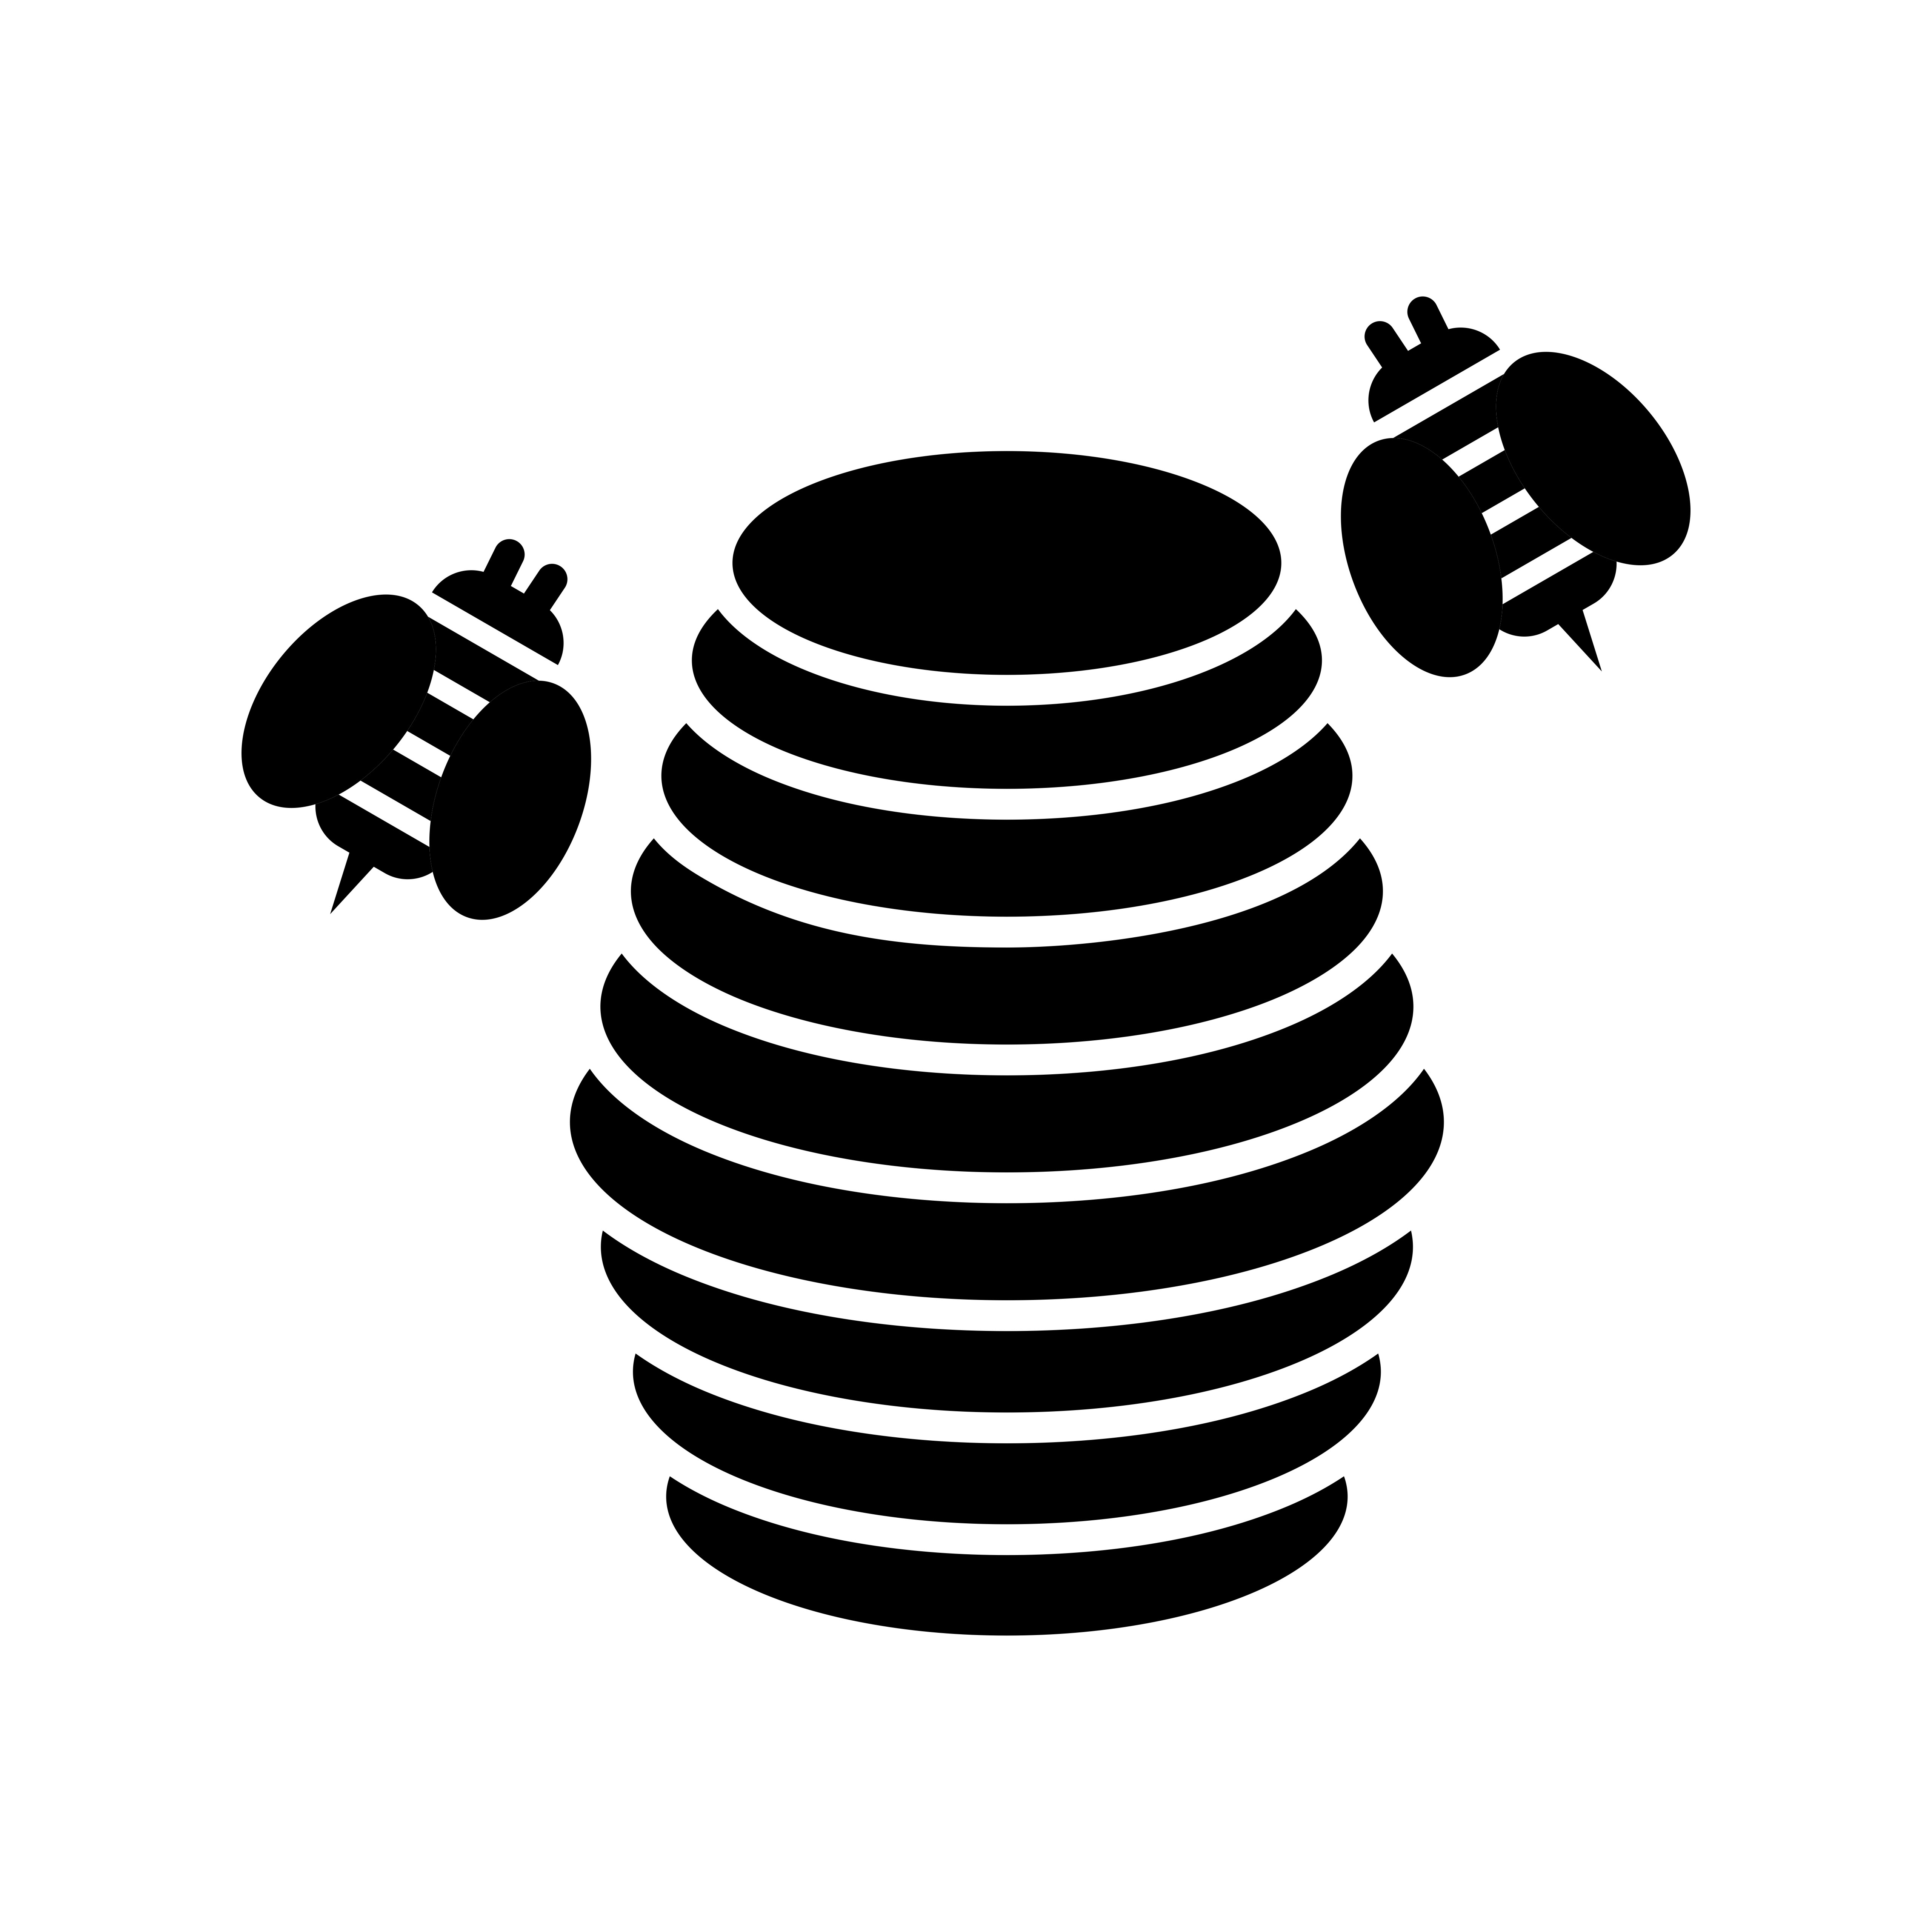 Hive Glyph Black Icon